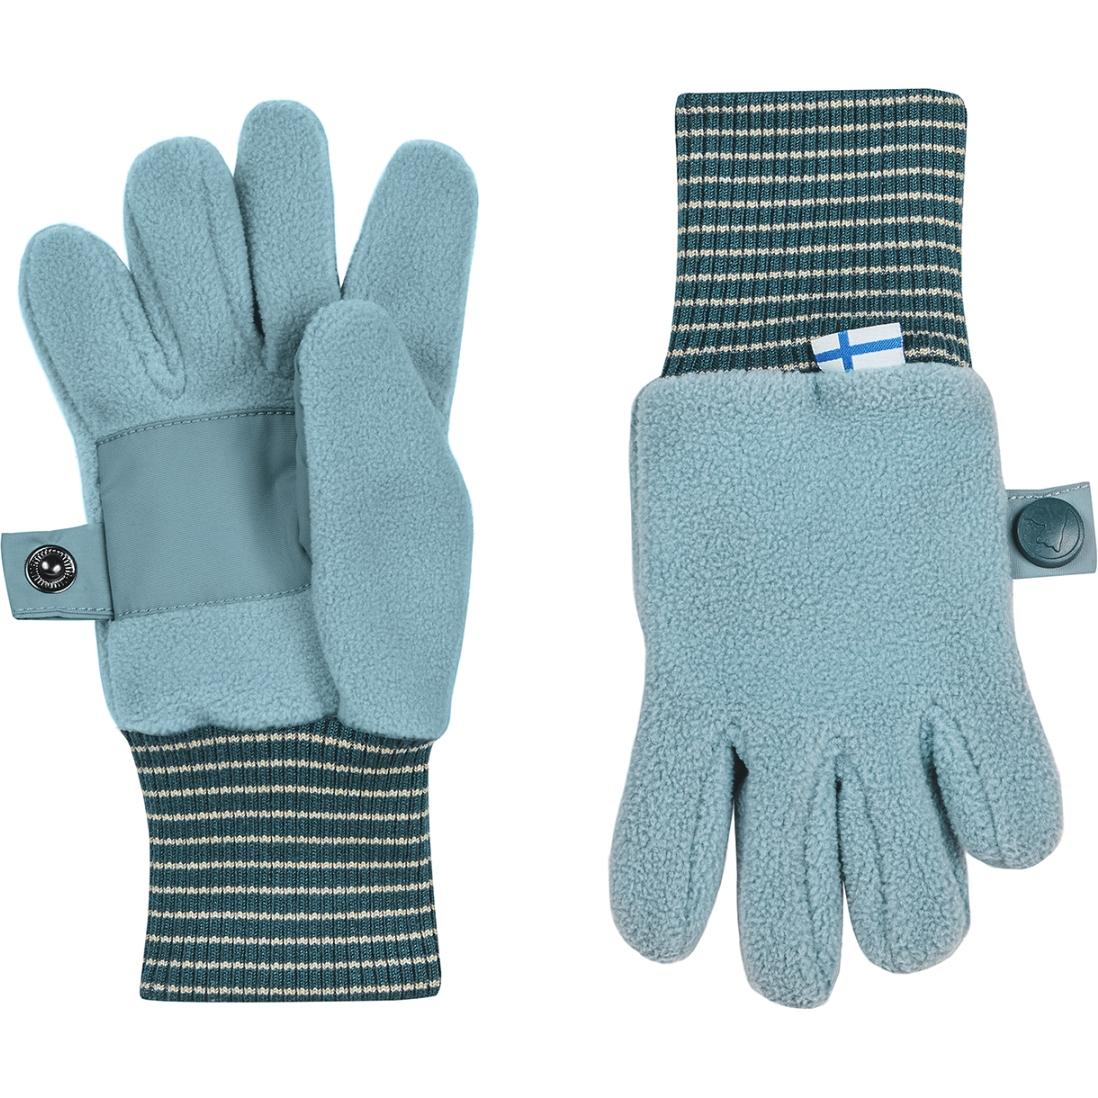 Picture of Finkid SORMIKAS Kids Winter Gloves - smoke blue/deep teal